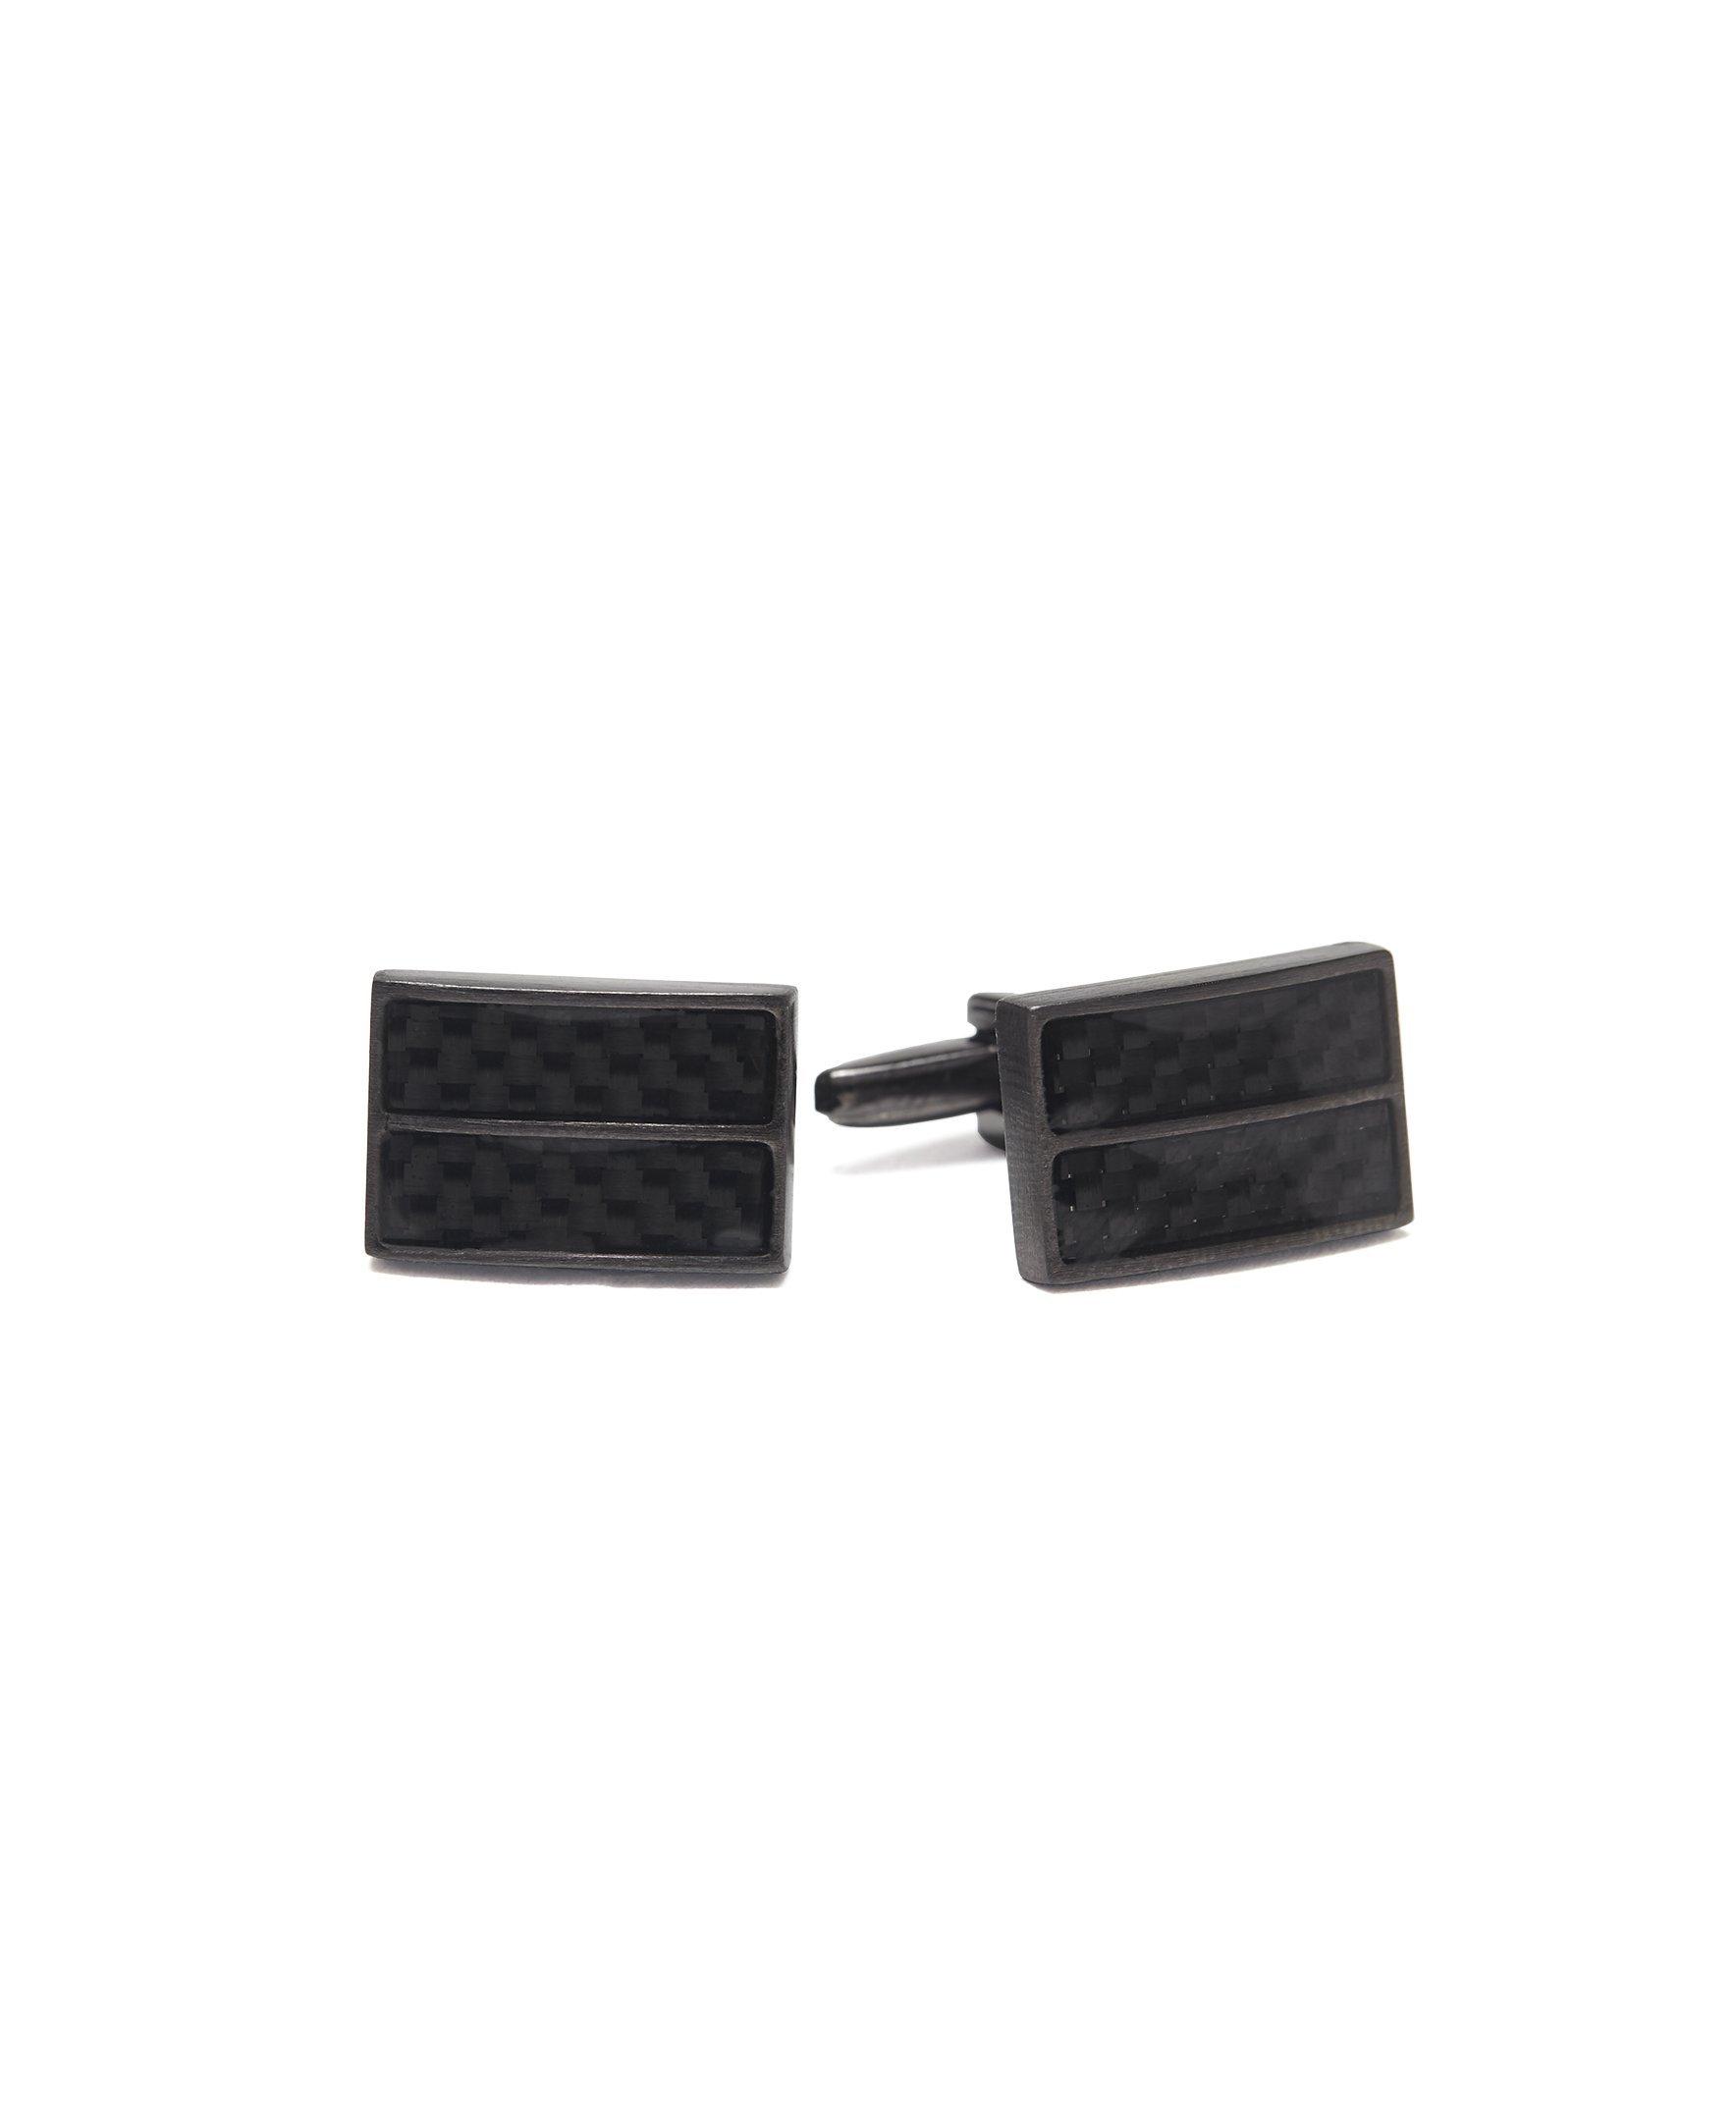 Kenneth Cole REACTION Men's Cufflinks, black gunmetal, One Size